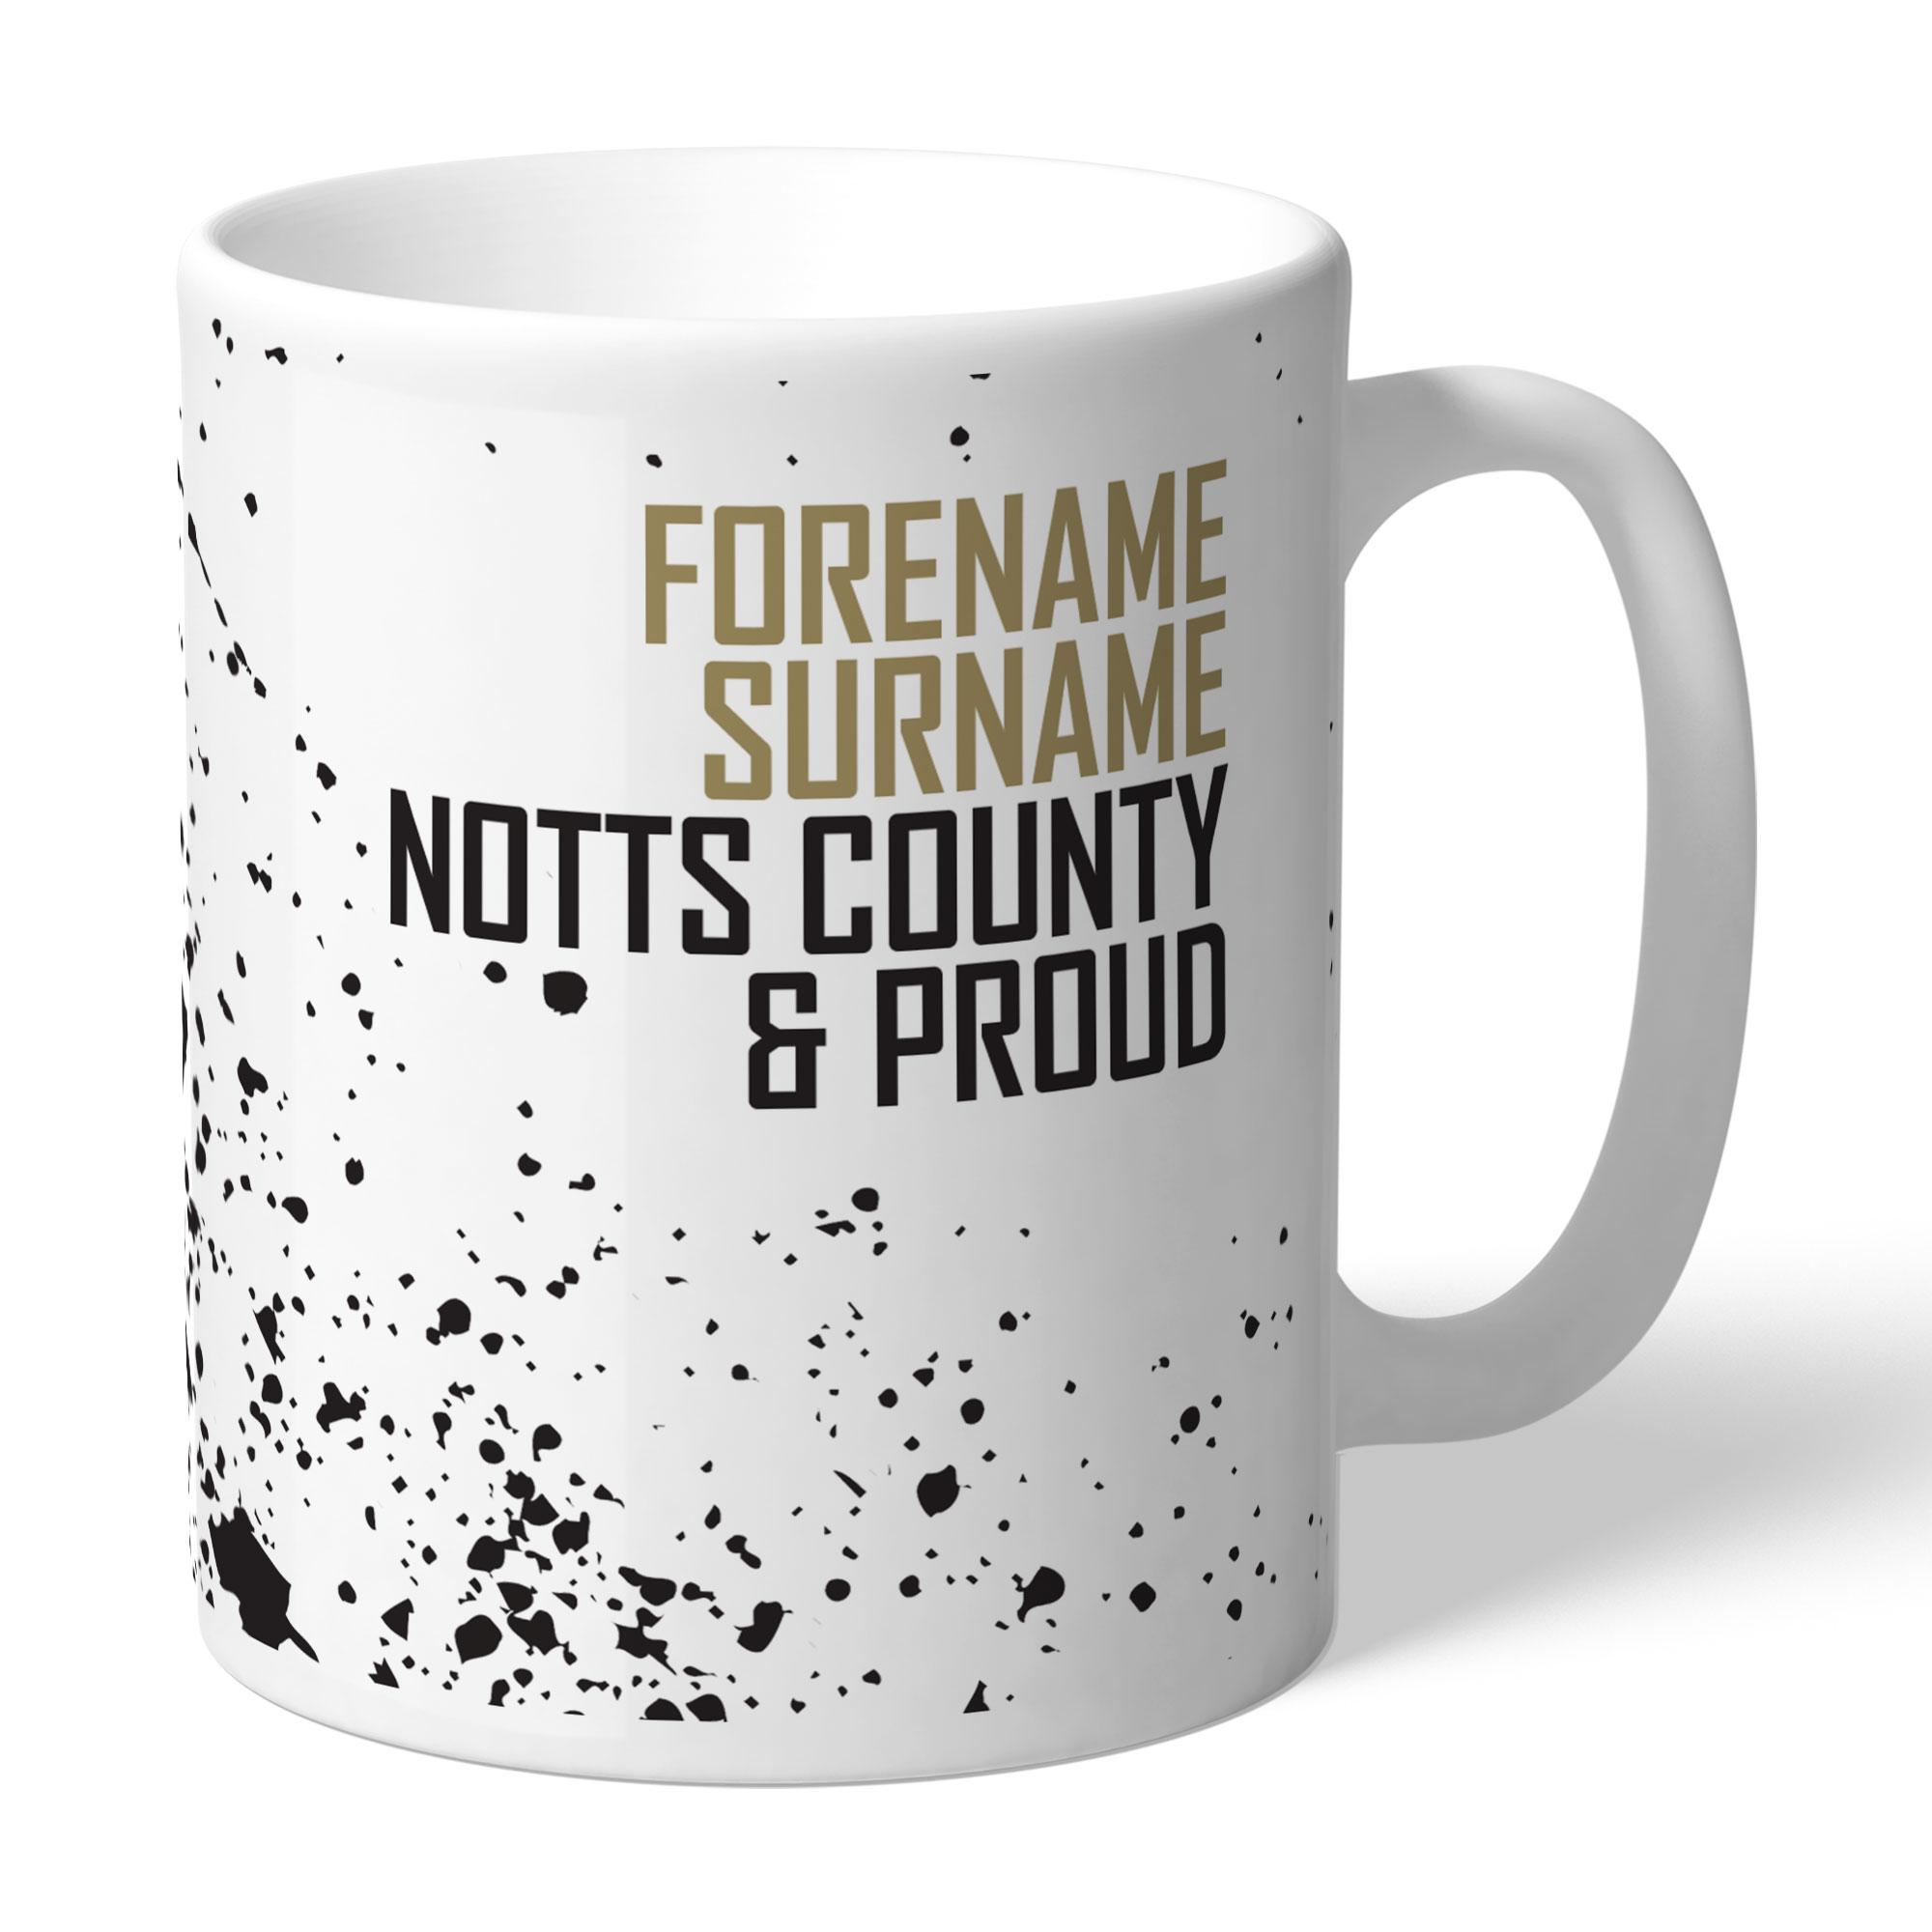 Notts County FC Proud Mug